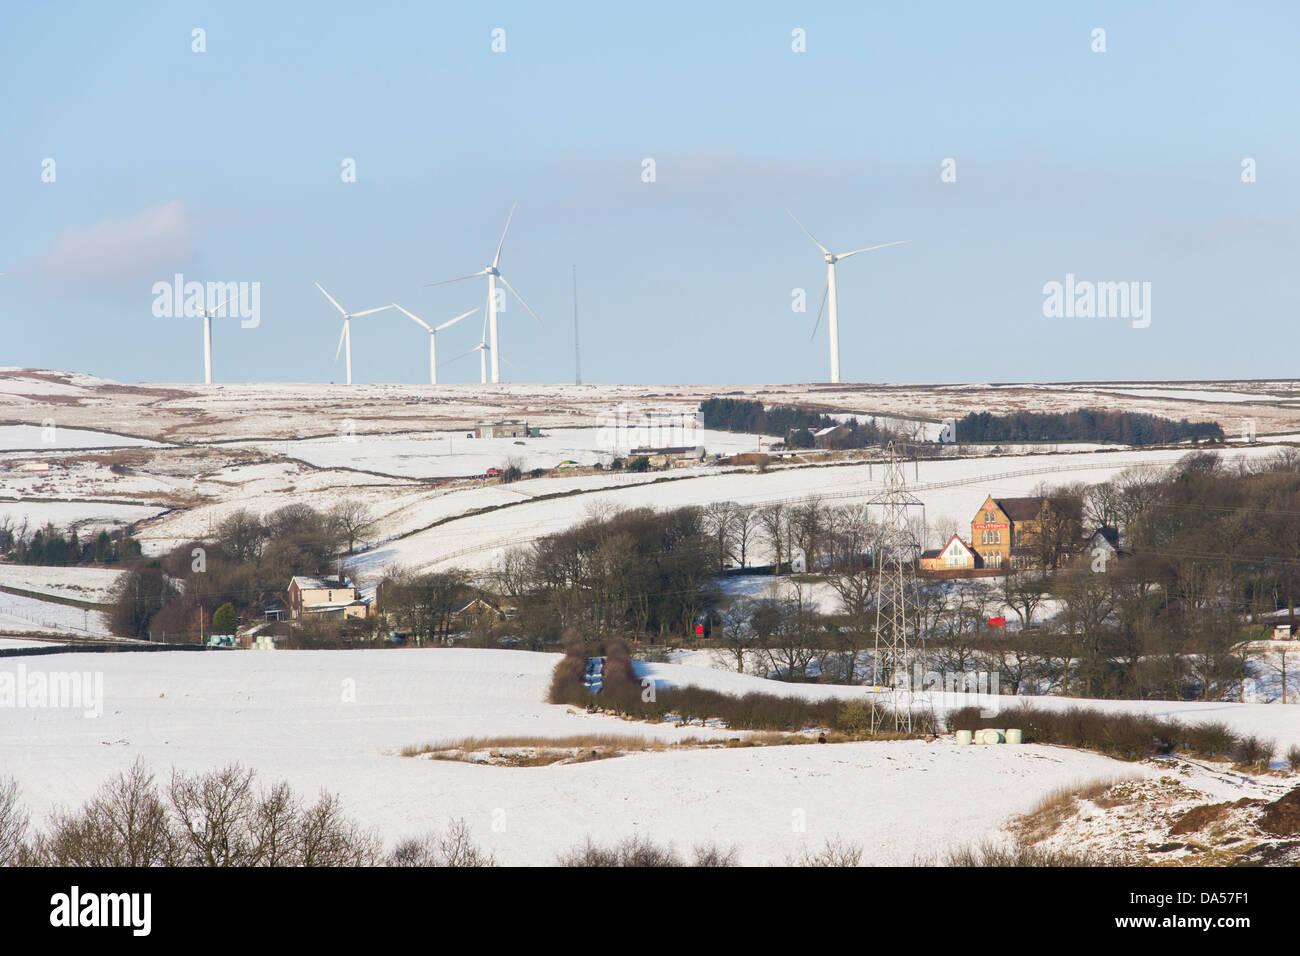 Wind turbines on Knowl Moor, overlooking Nutters restaurant, Edenfield Road, near Rochdale. - Stock Image